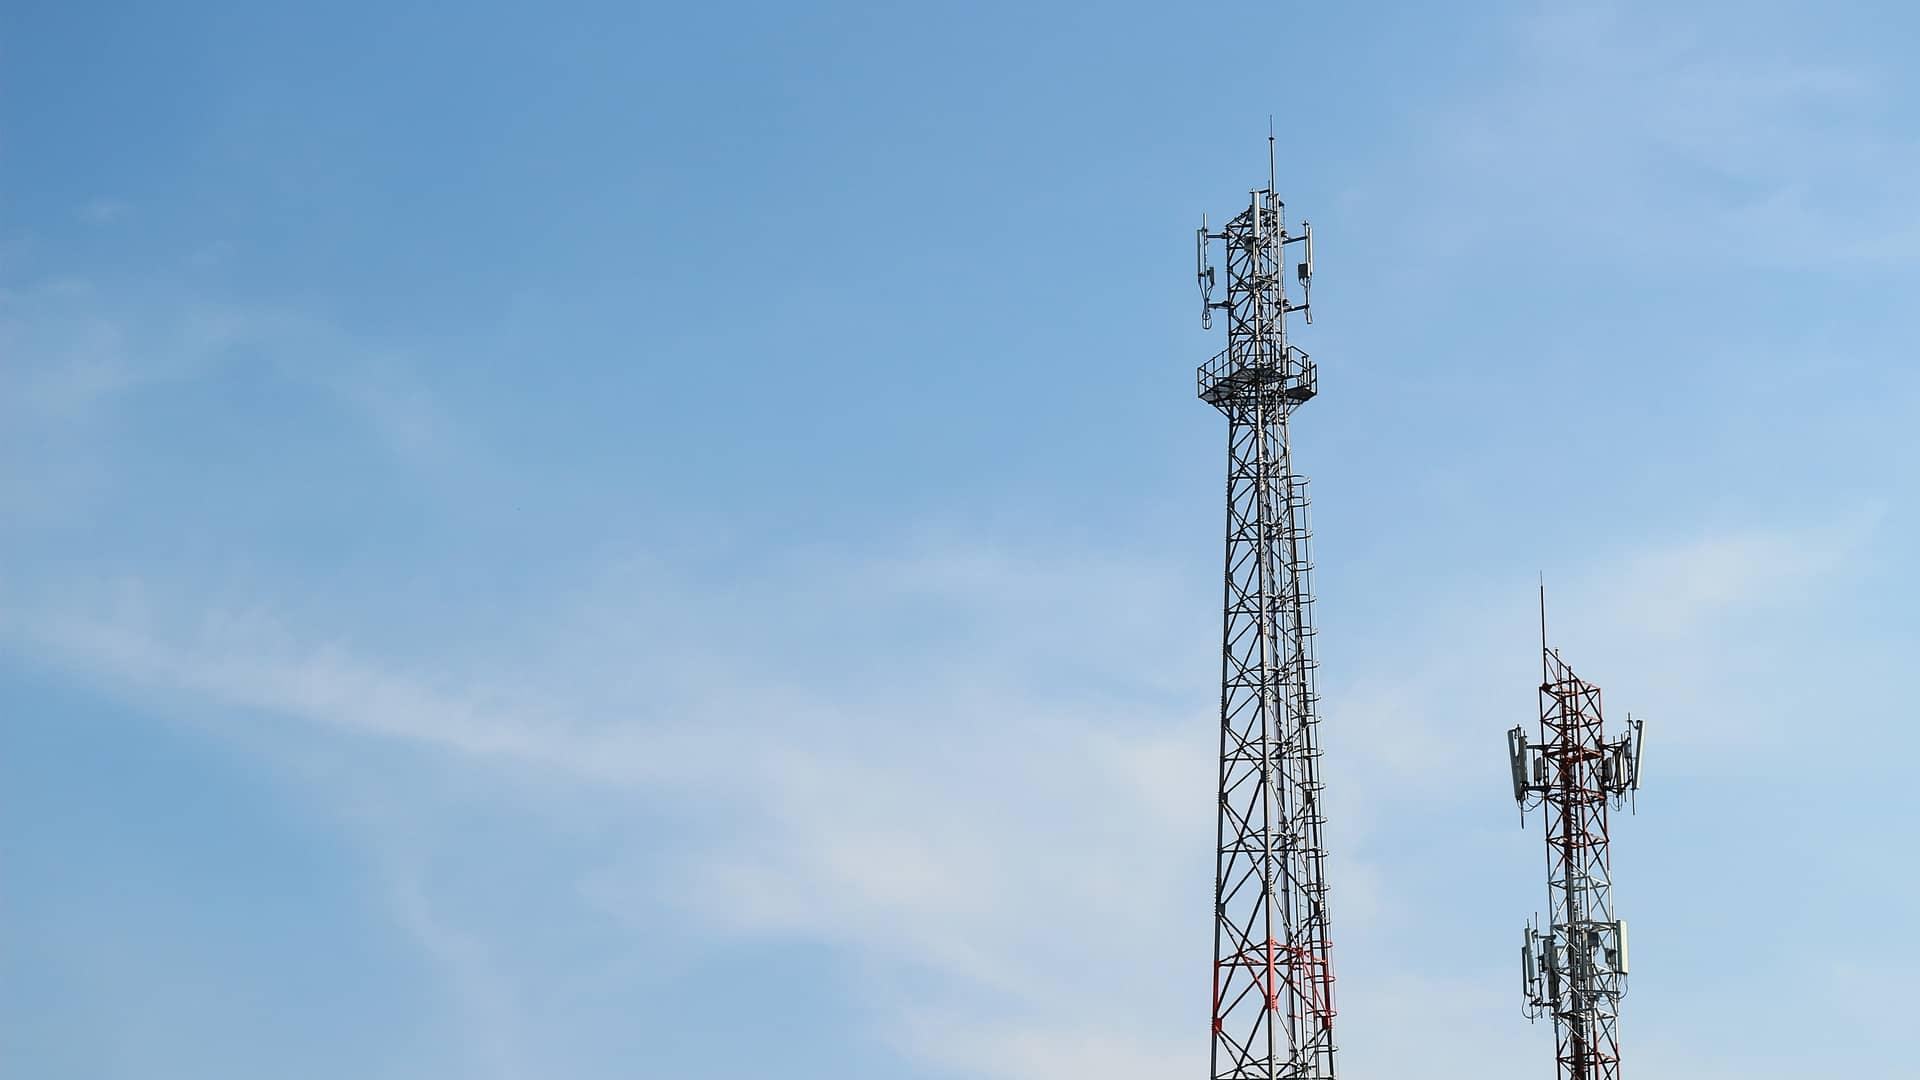 Antena de telecomunicaciones simboliza cobertura 5g de telecable